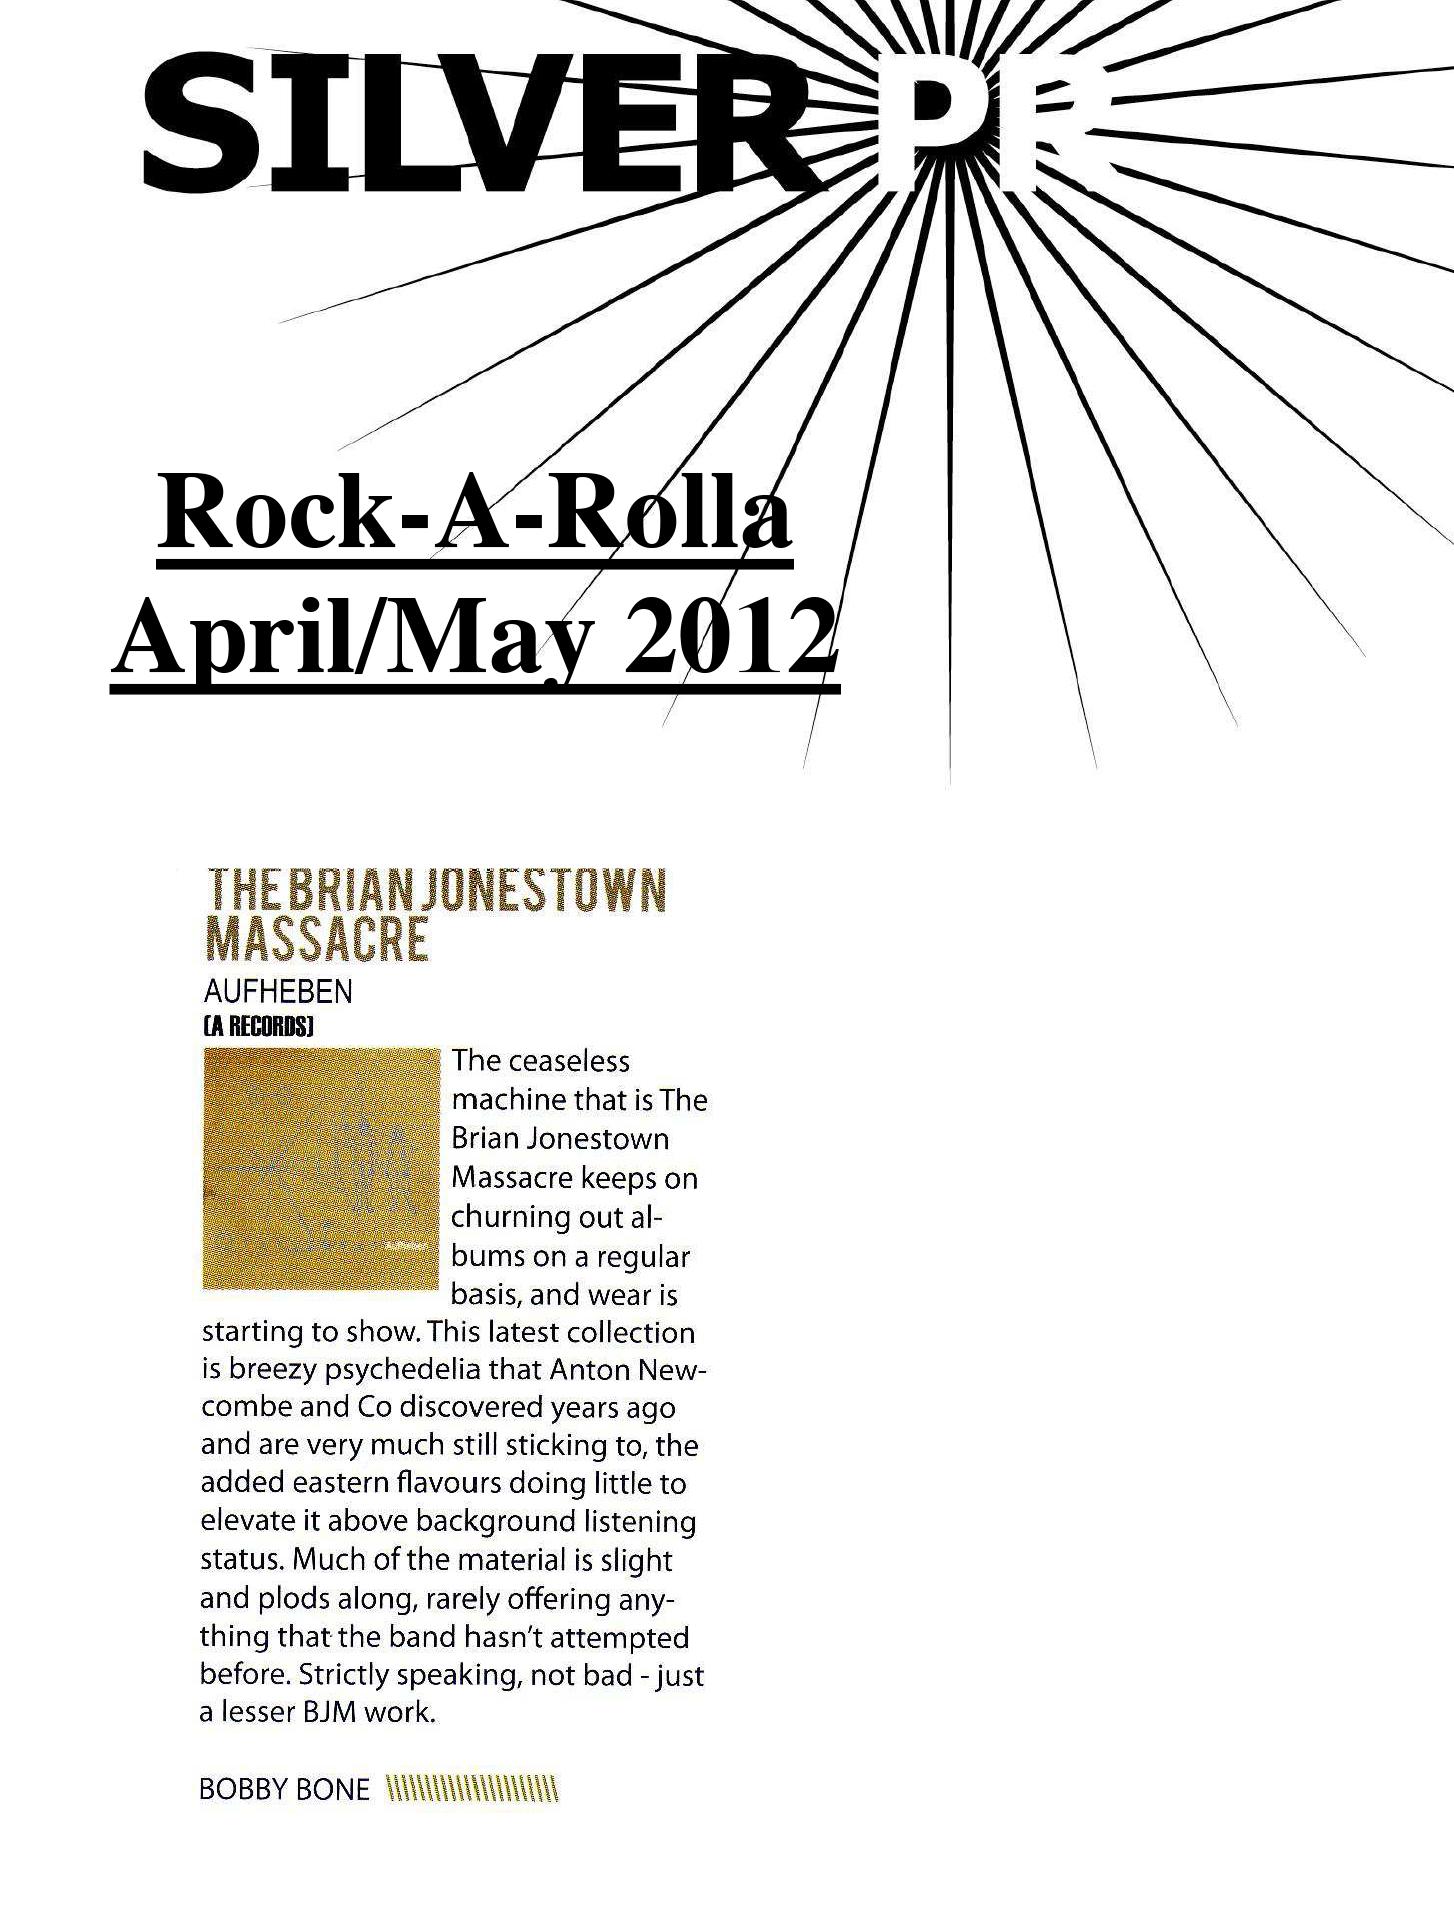 Rock A Rolla